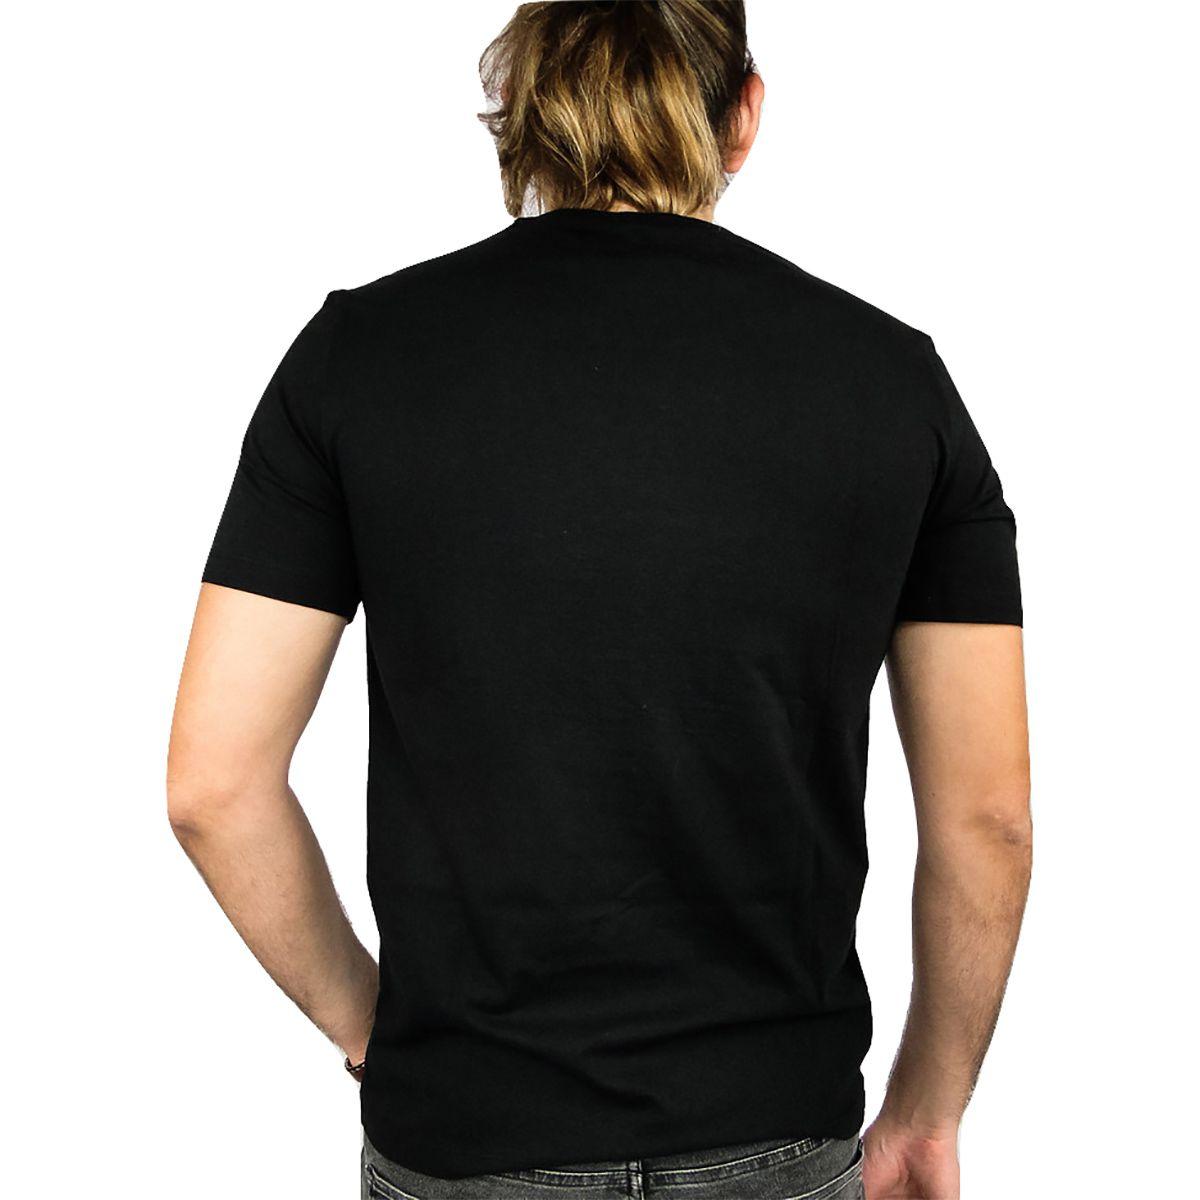 Camiseta Cavalera Masculina Kurt Cobain Nirvana